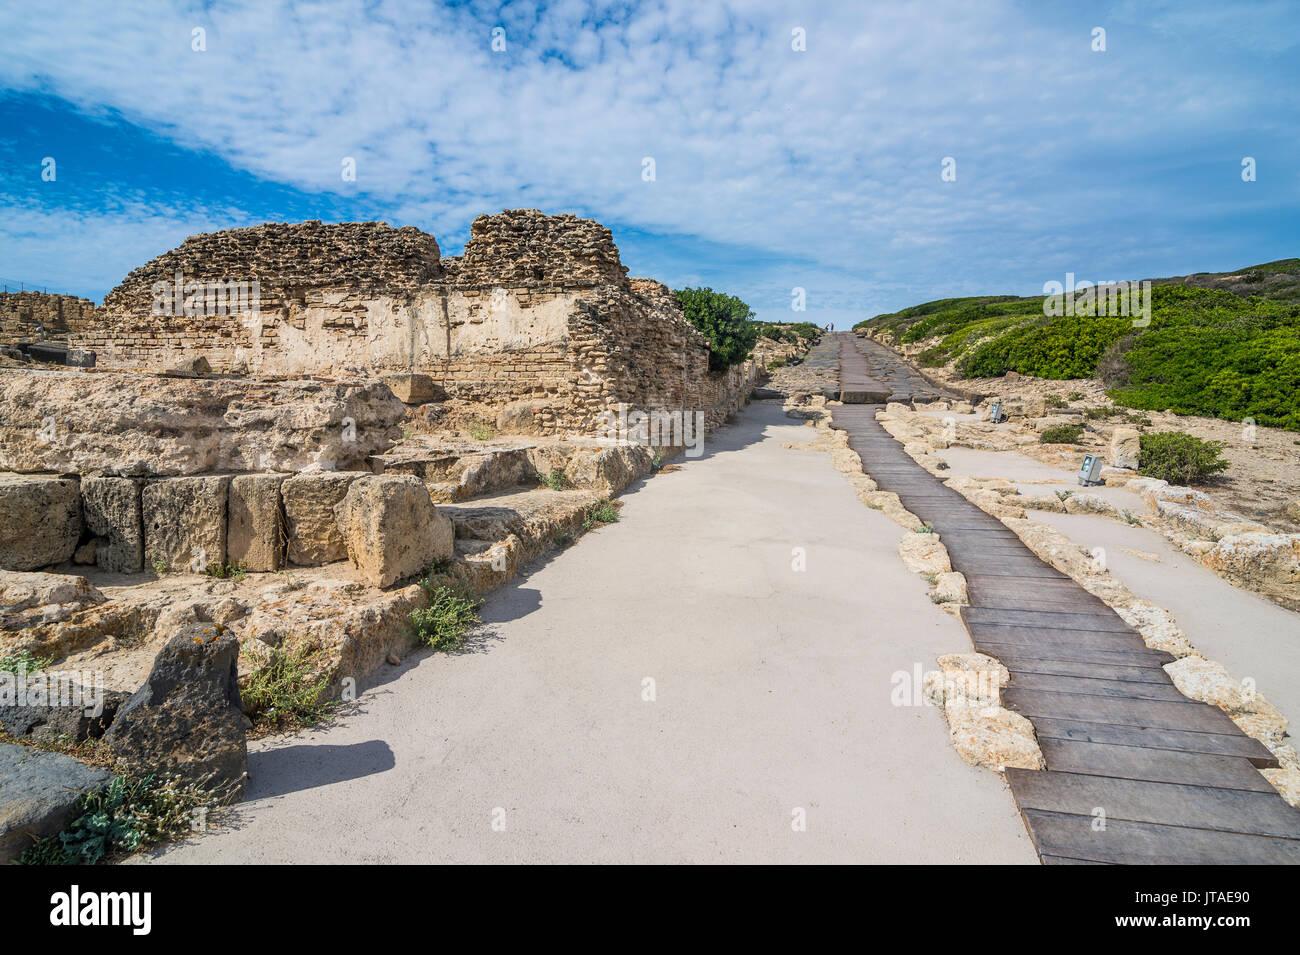 Archaeological site of Tharros, Sardinia, Italy, Mediterranean, Europe - Stock Image